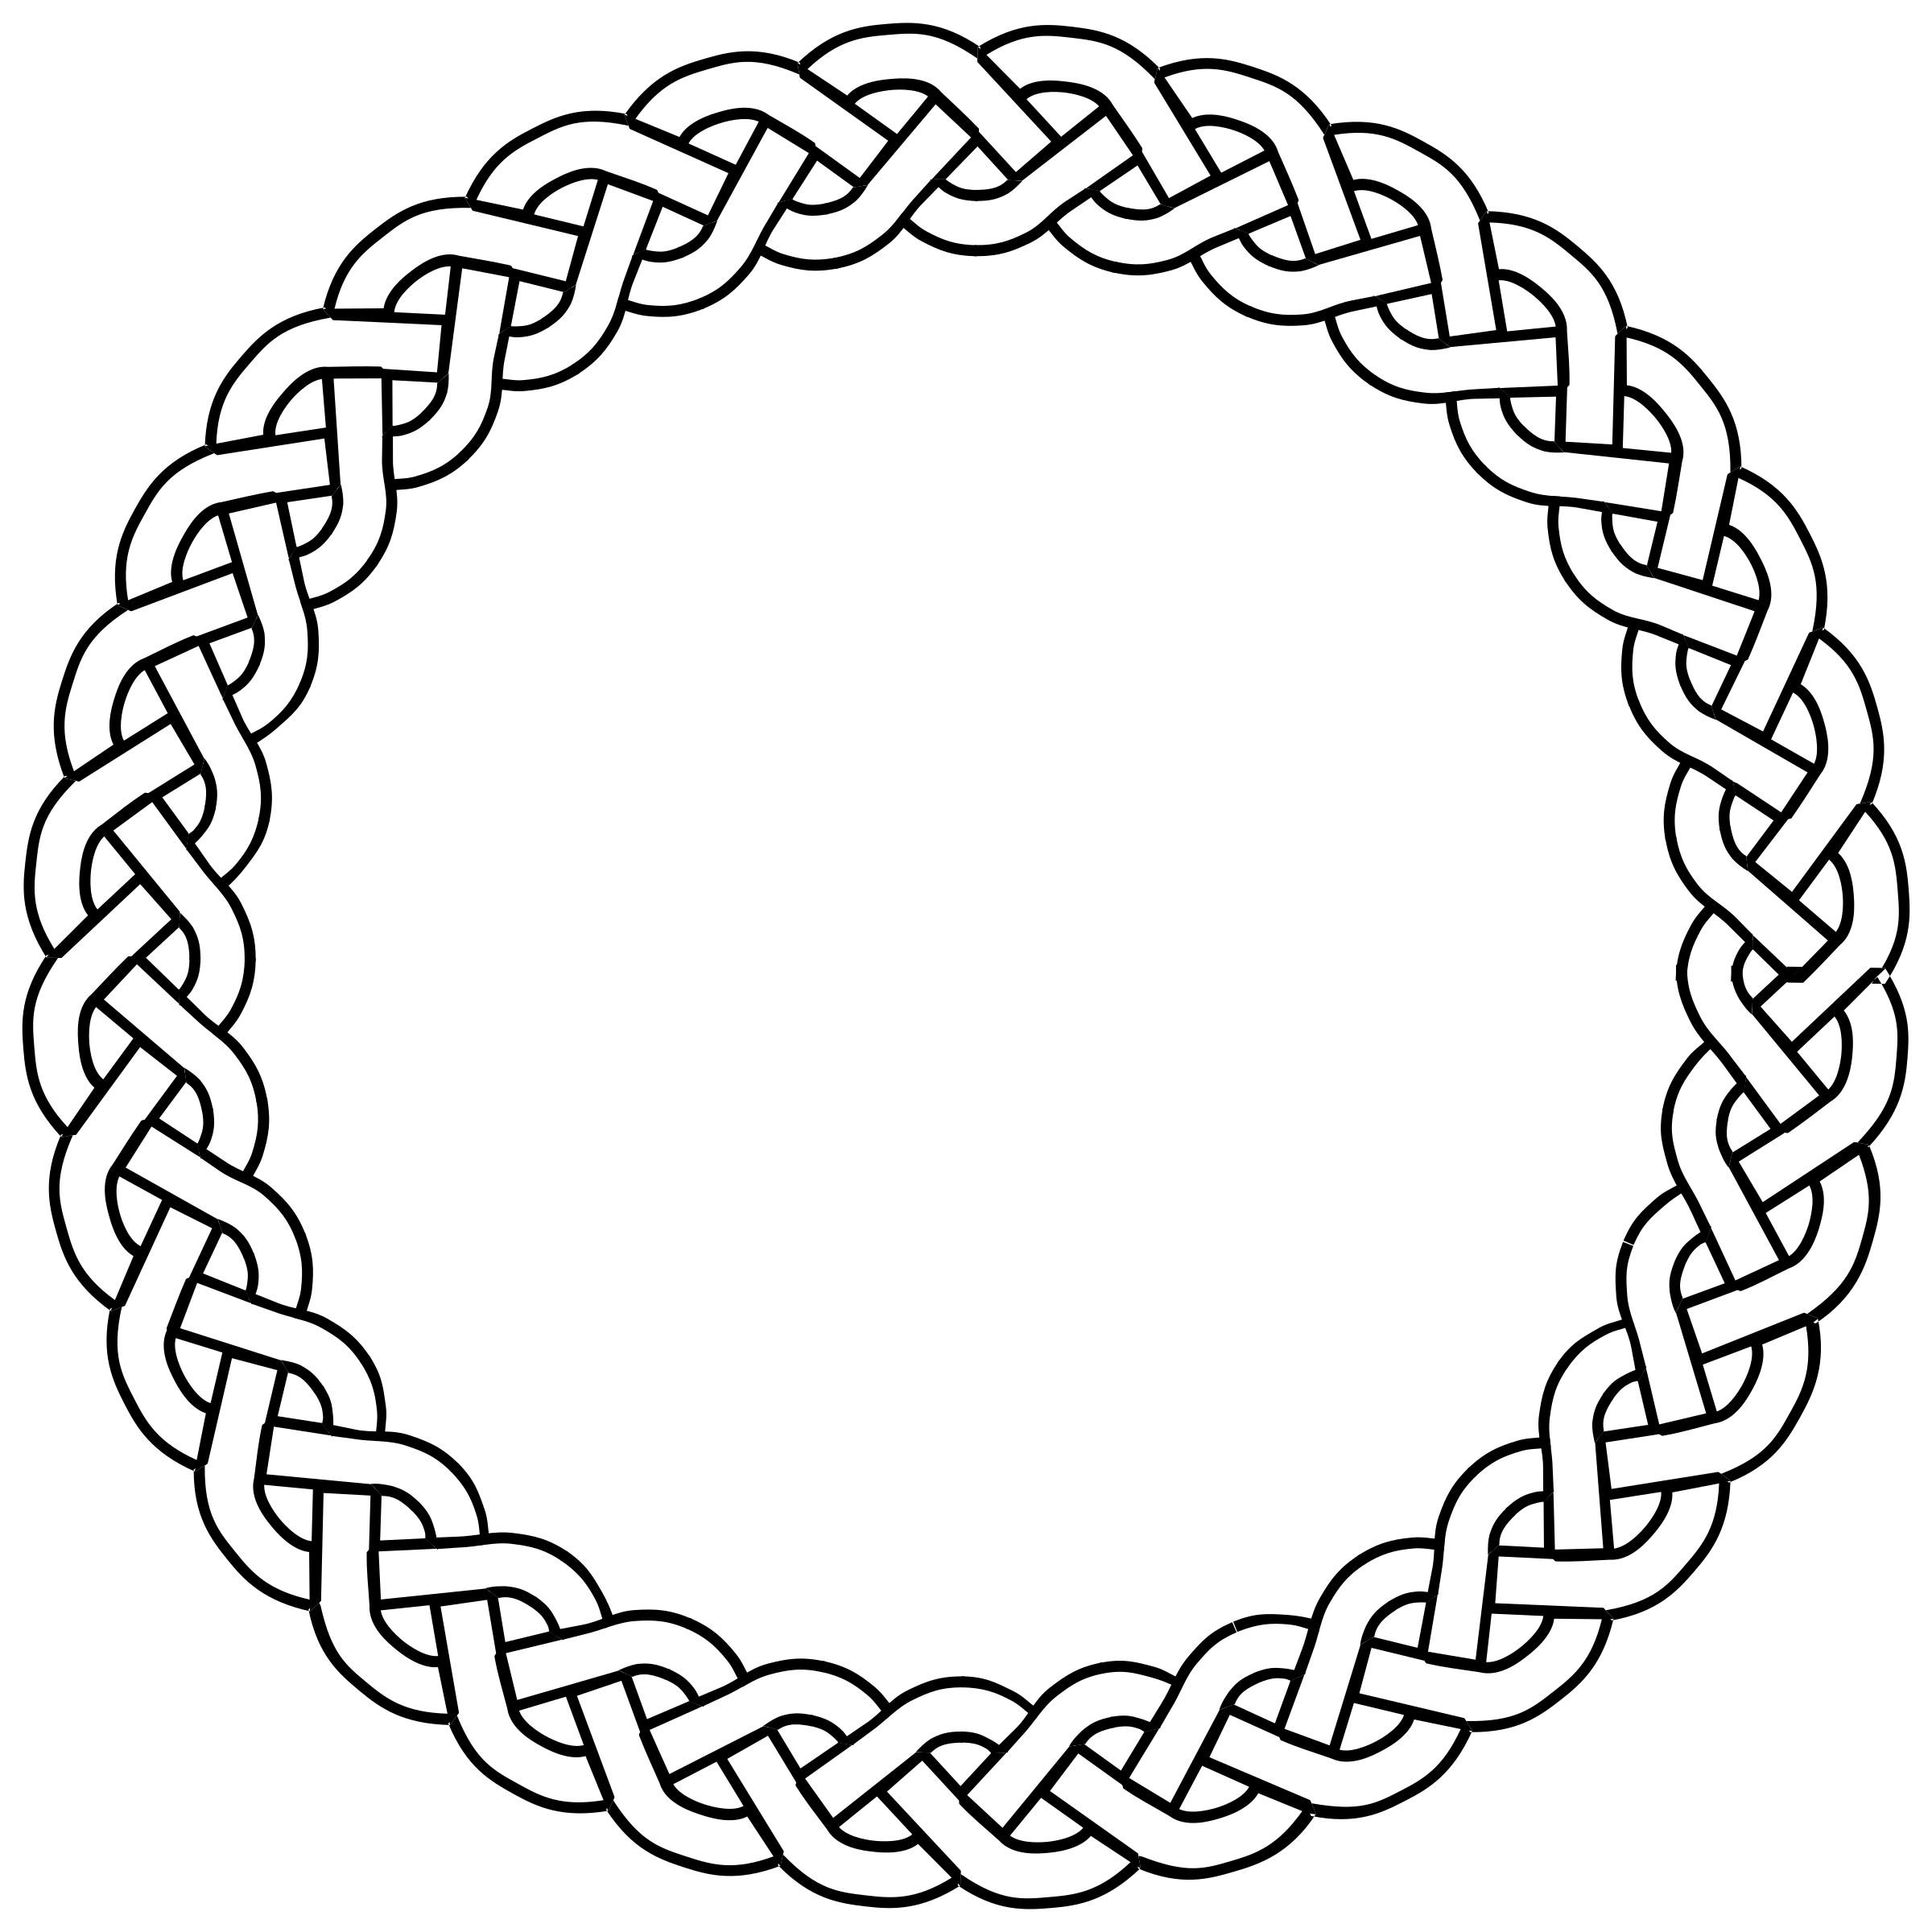 Circle border png. Clipart plait big image